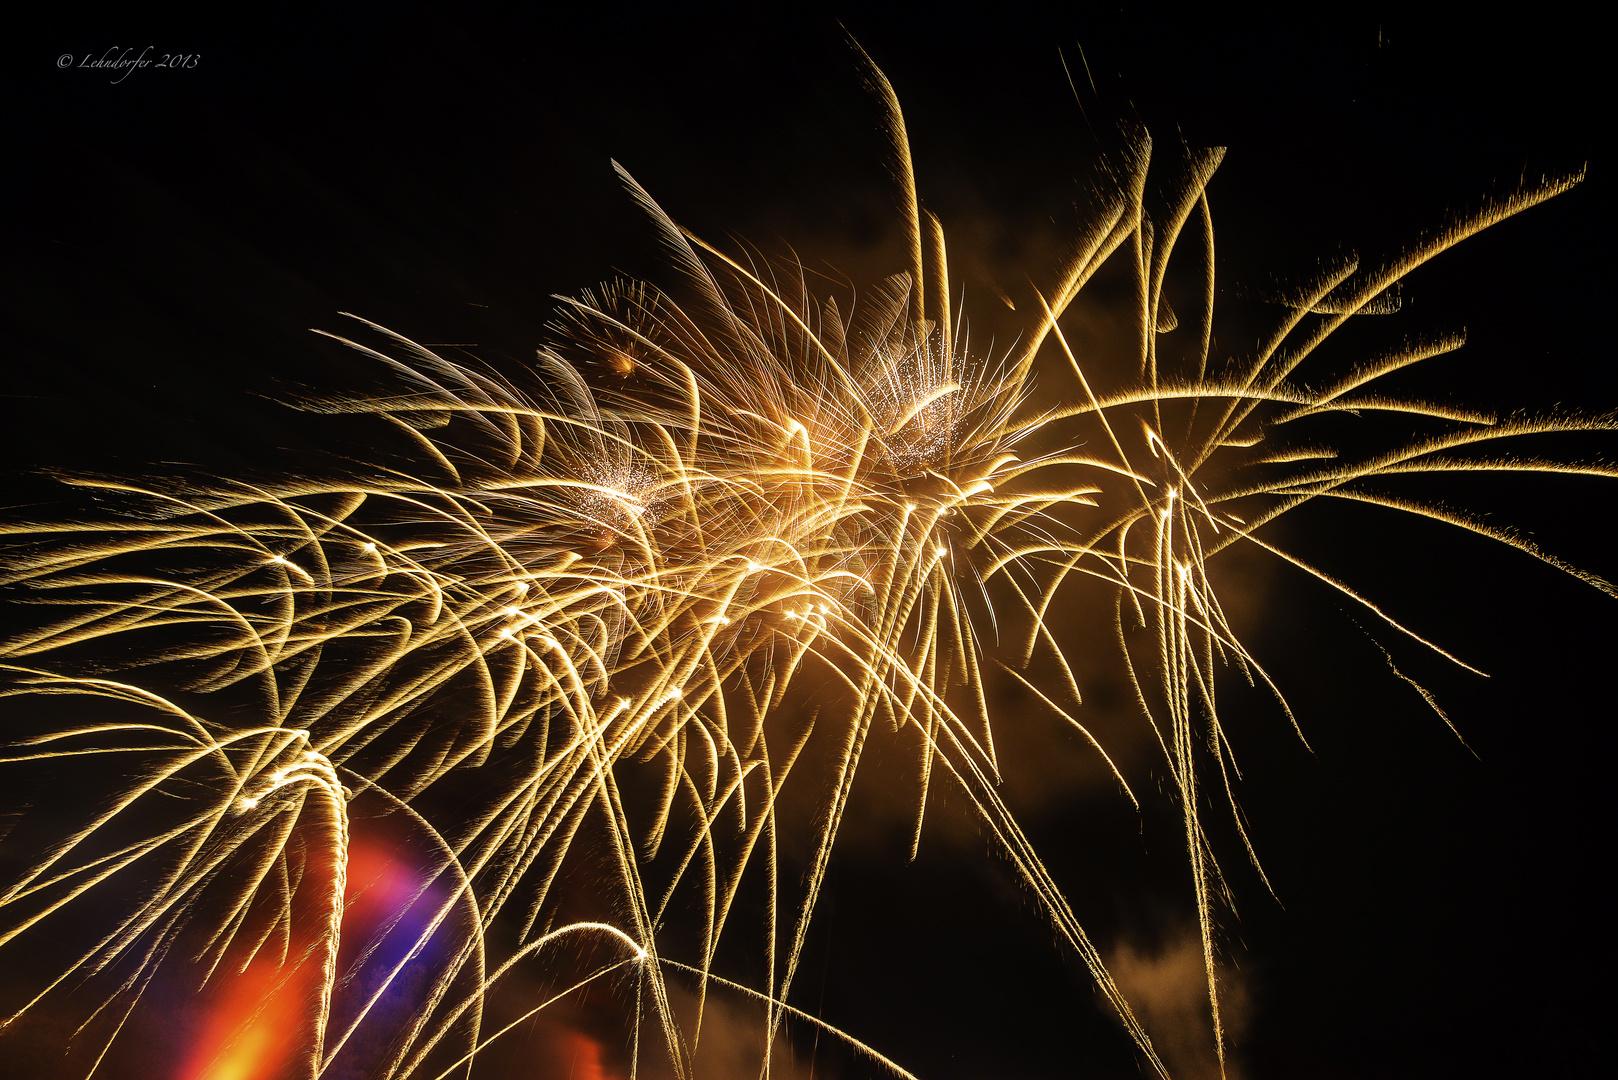 we had some fireworks last night